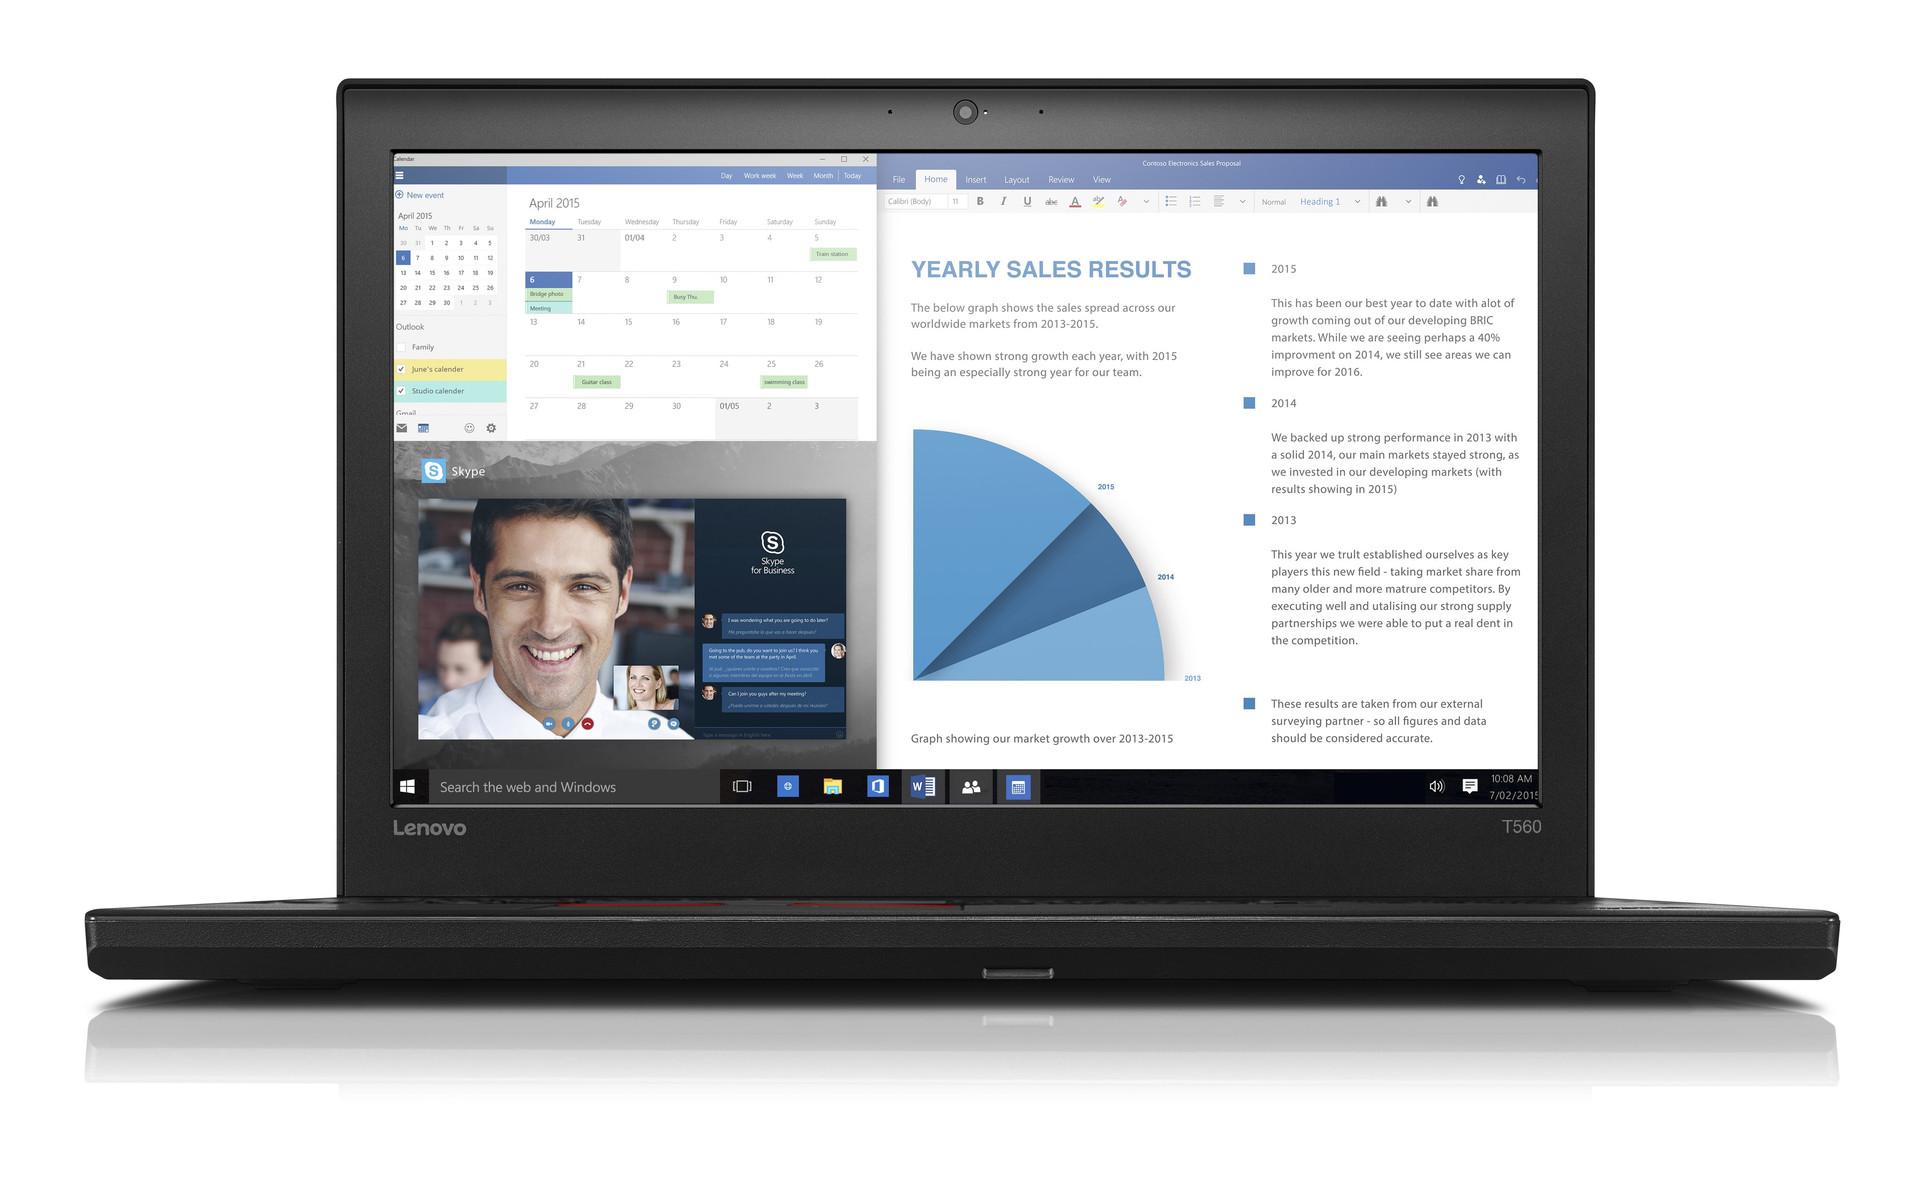 Lenovo ThinkPad T560 NVIDIA Graphics Treiber Windows 10